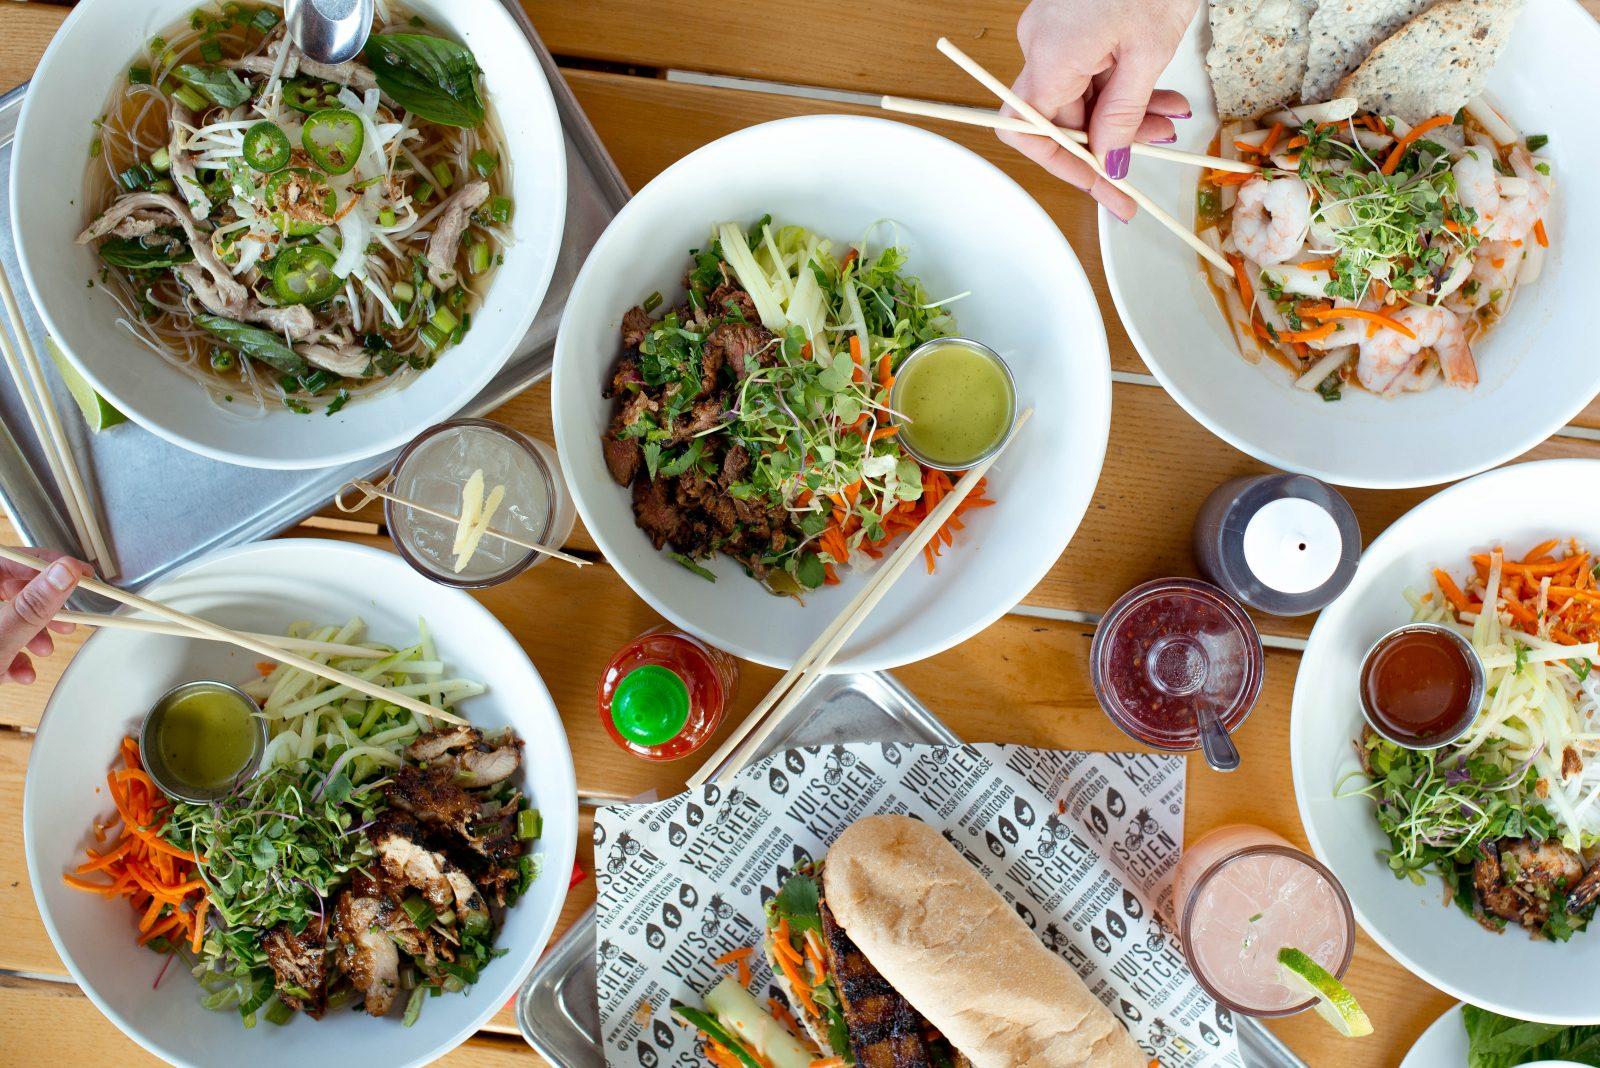 vui's kitchen Vietnamese food berry hill outdoor patio lunch